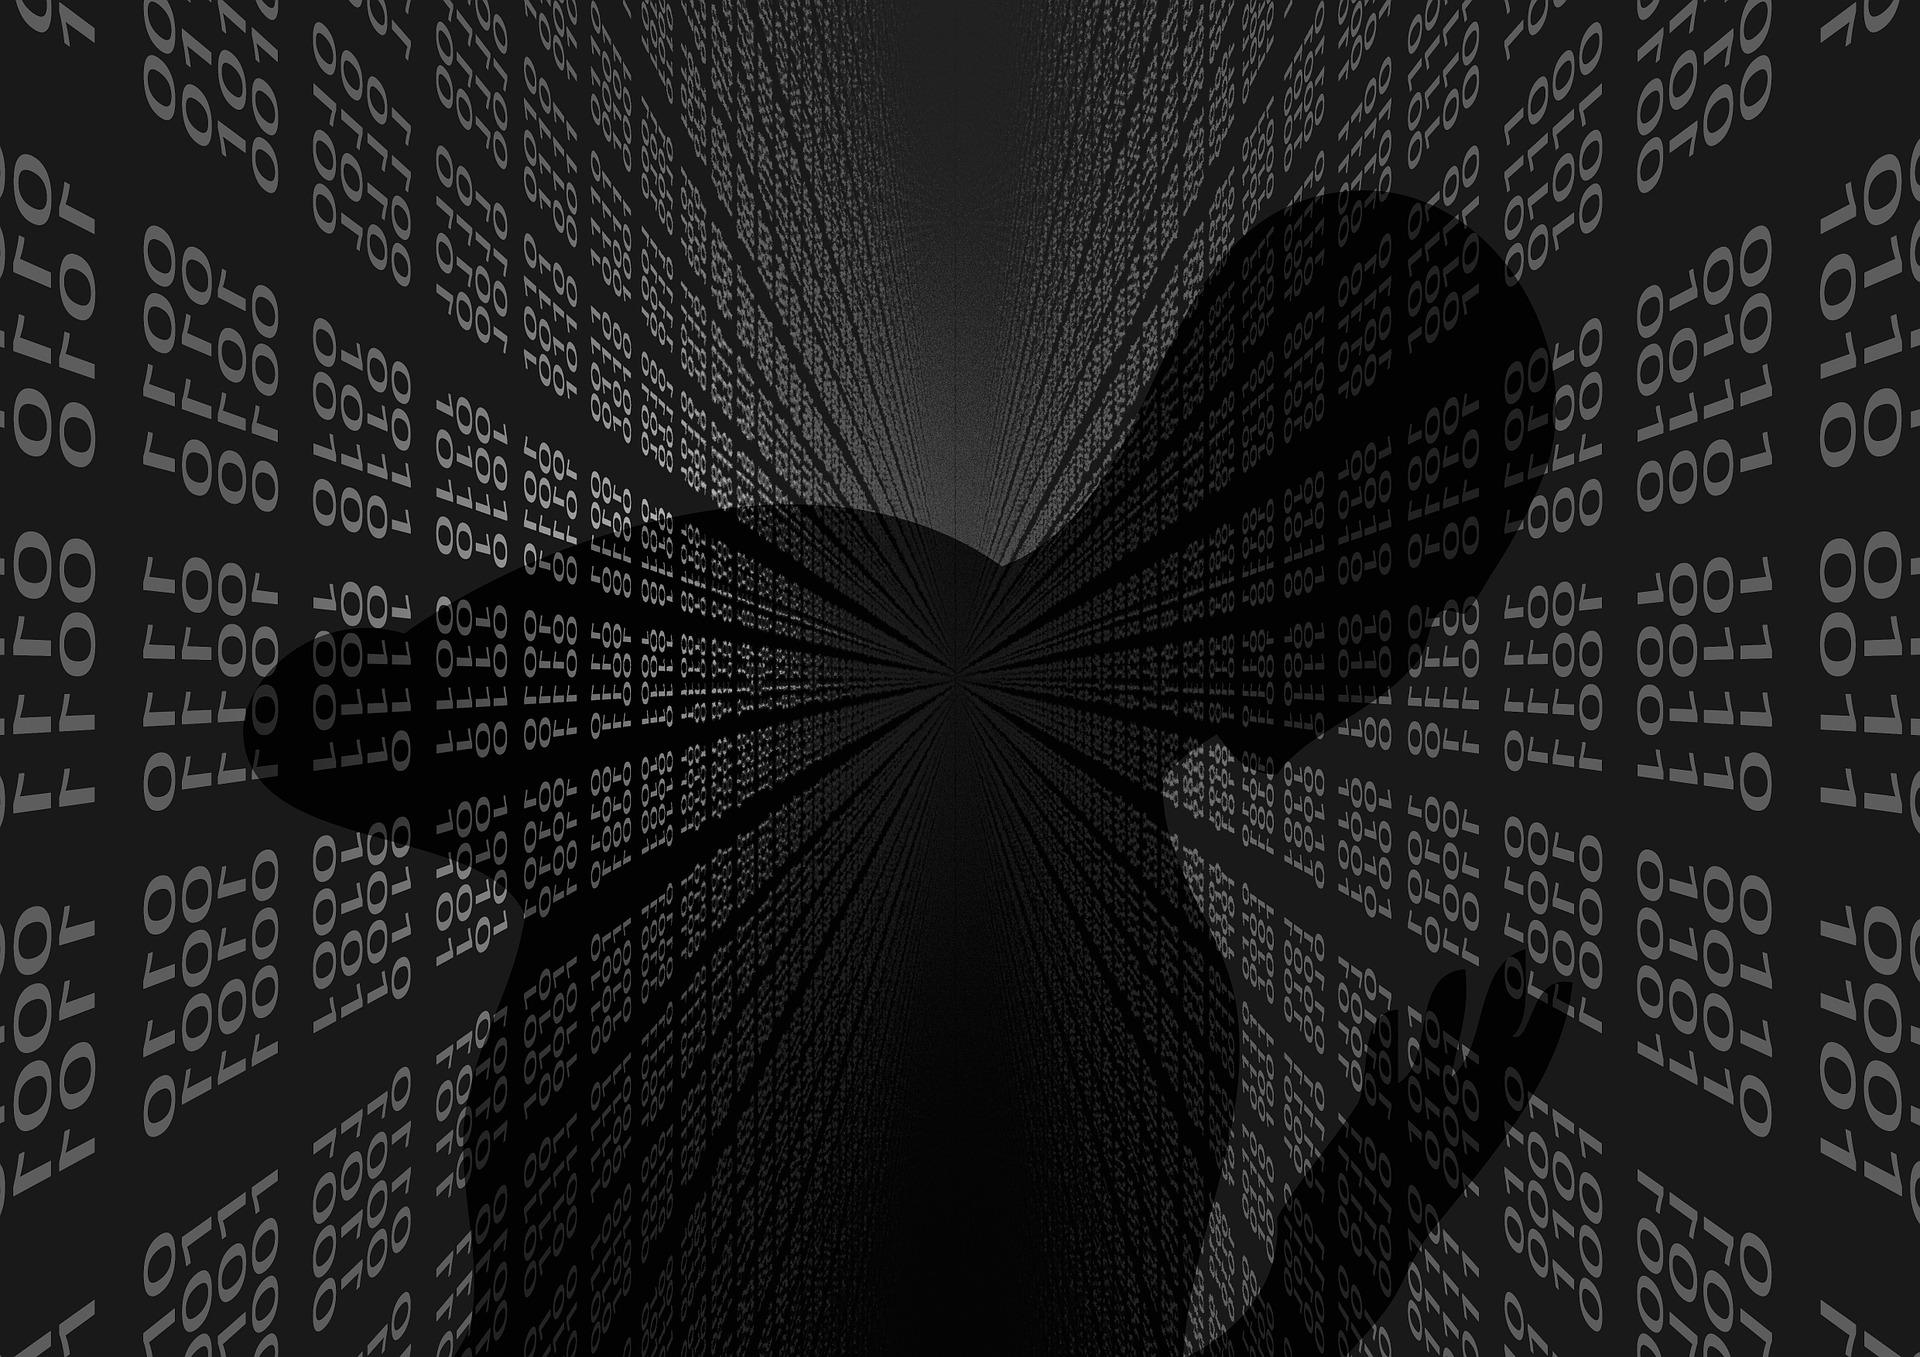 binary-797270_1920